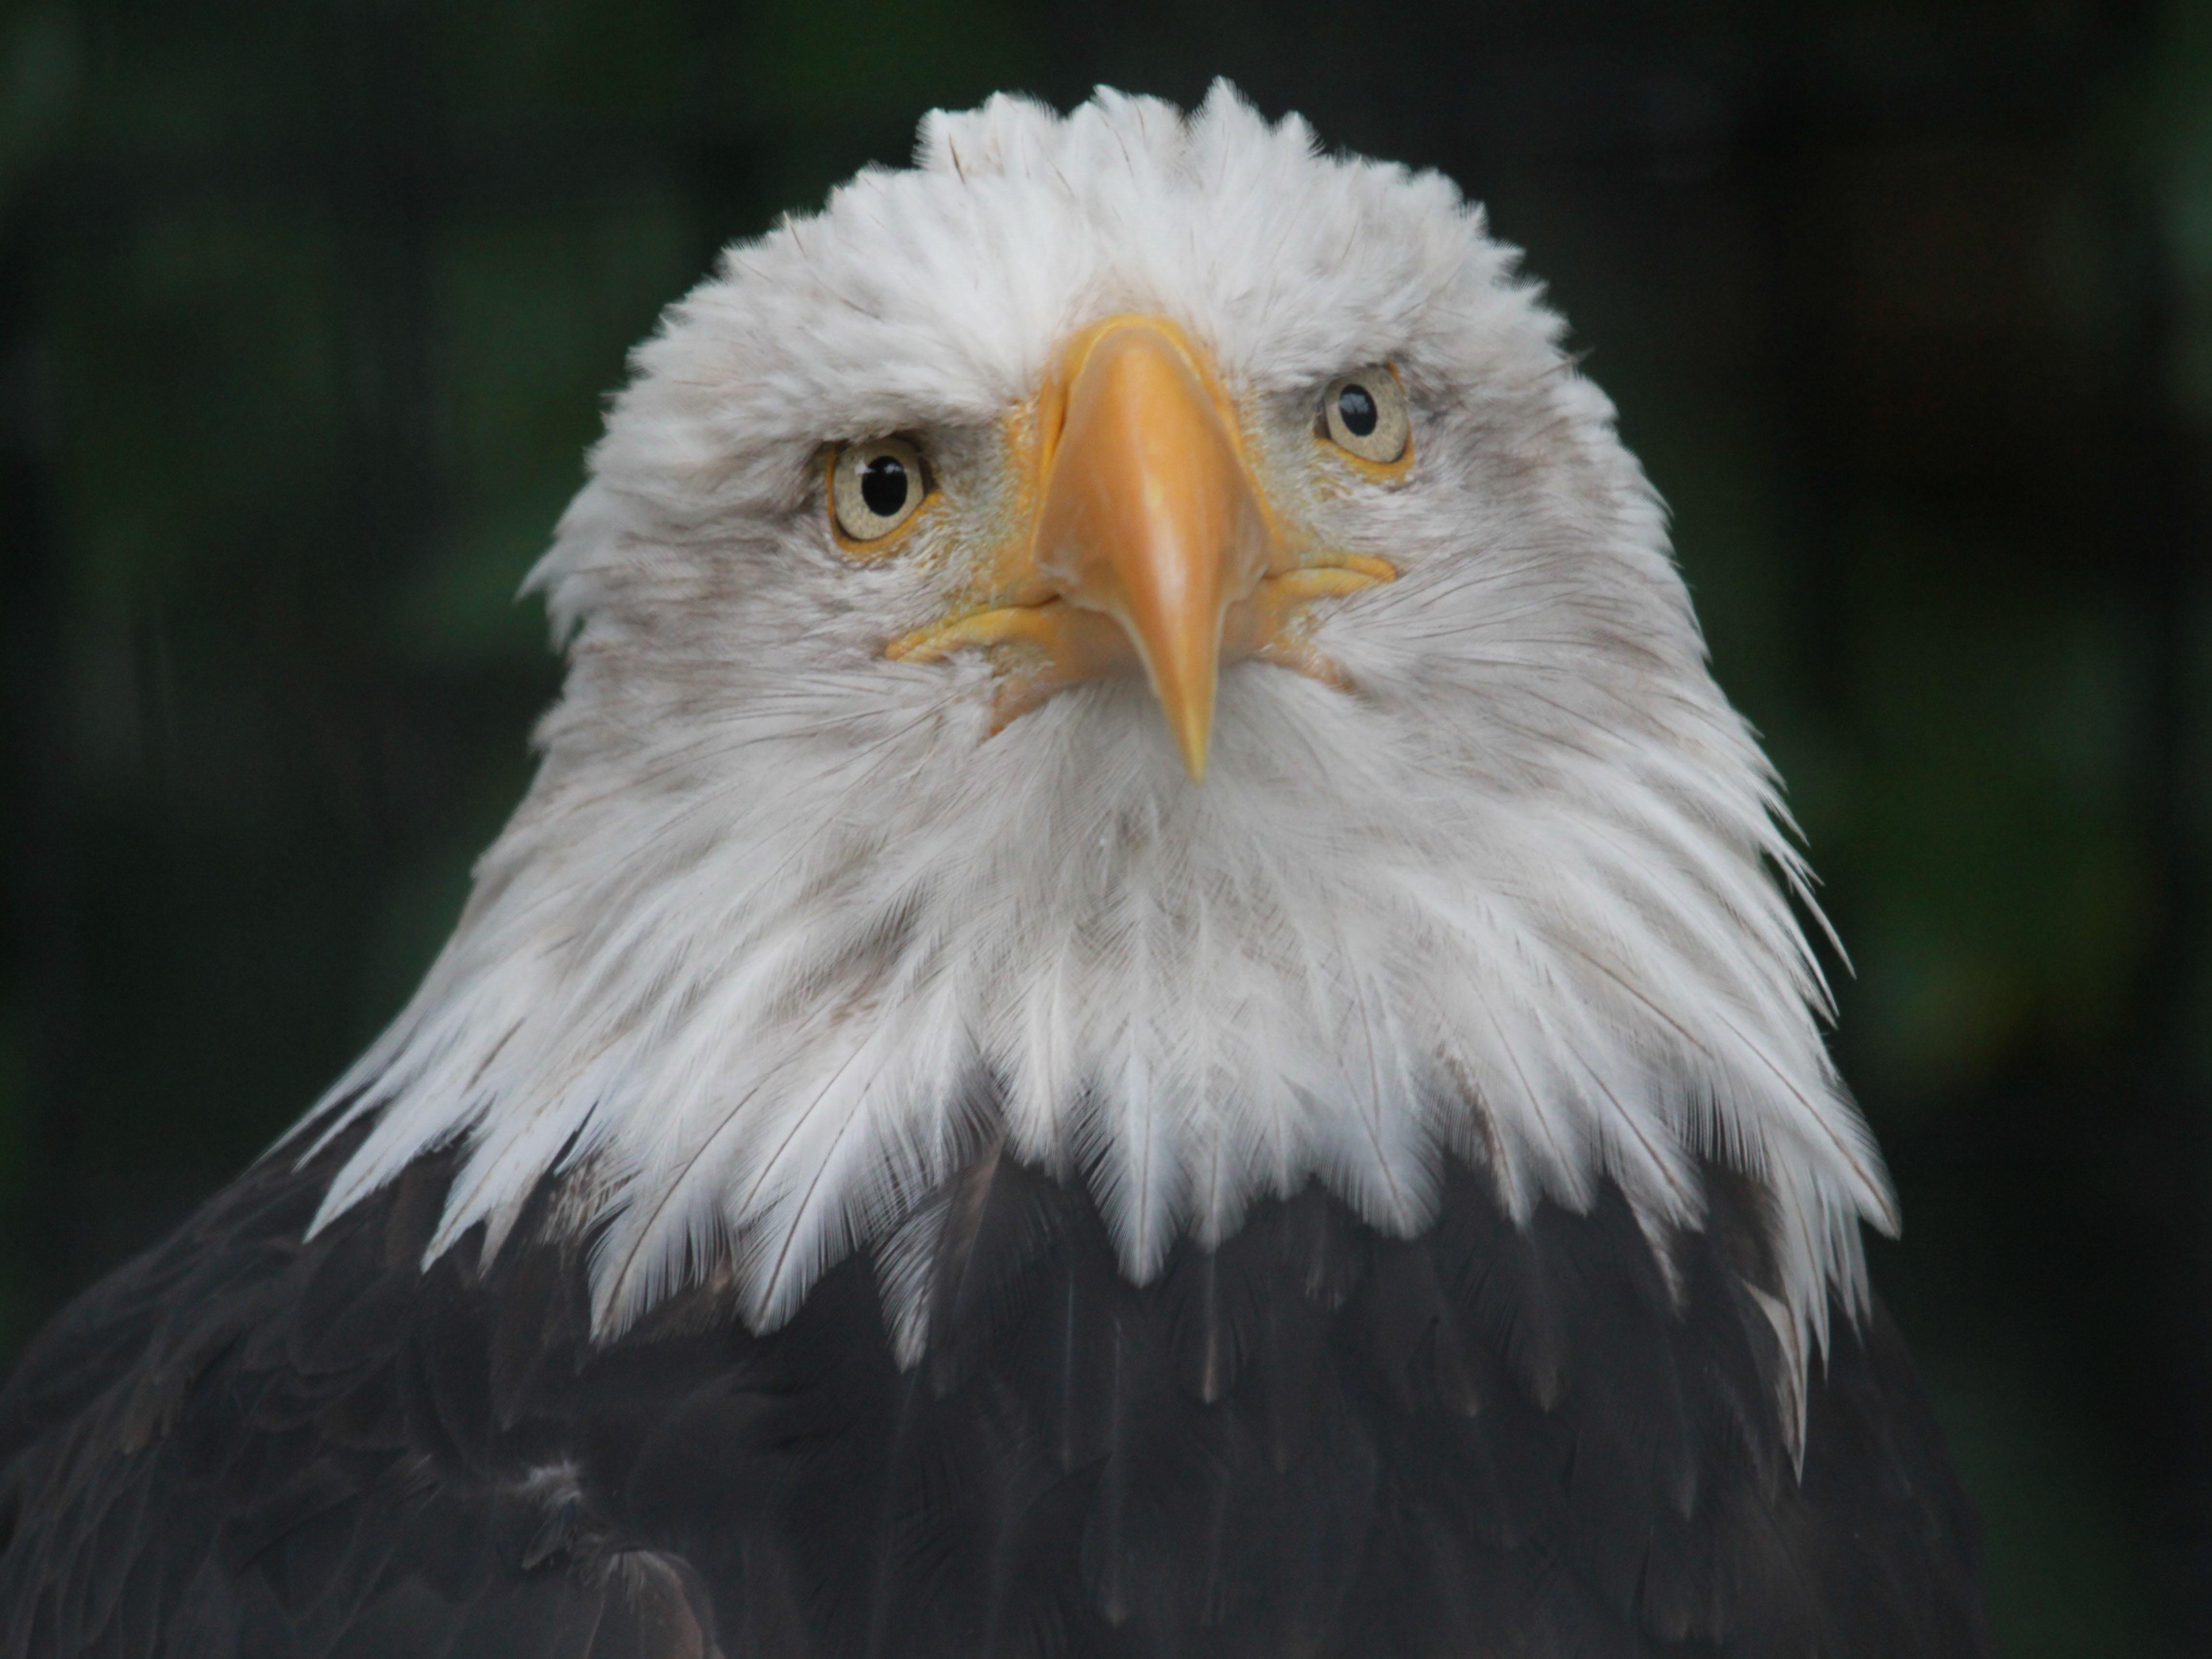 Bald eagle head front - photo#24